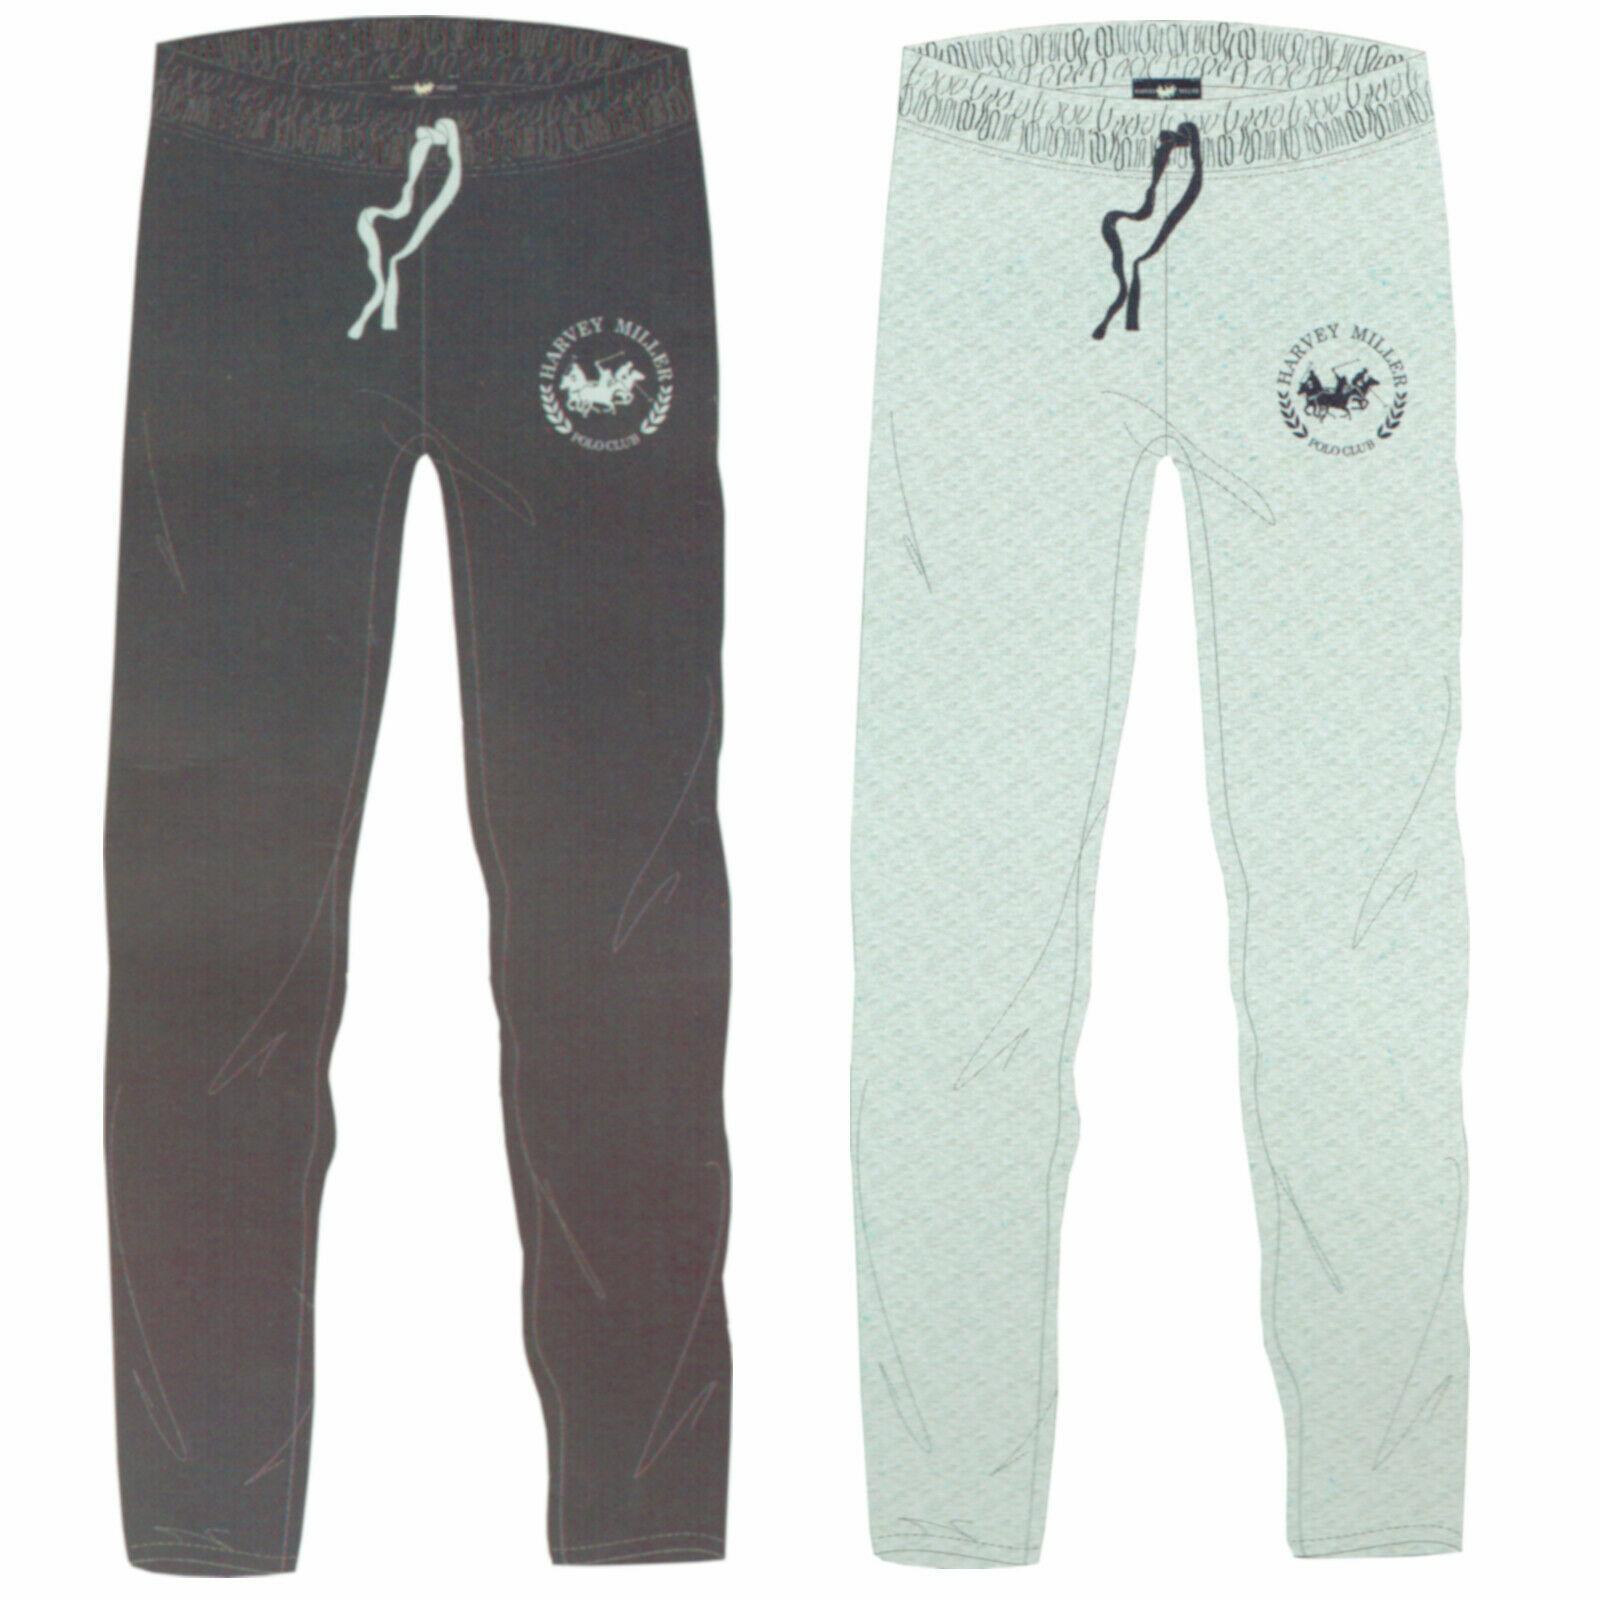 Harvey Miller Polo Club Pyjamahose Gr. M-2XL Herren Schlafhose Grau Blau Öko-Tex